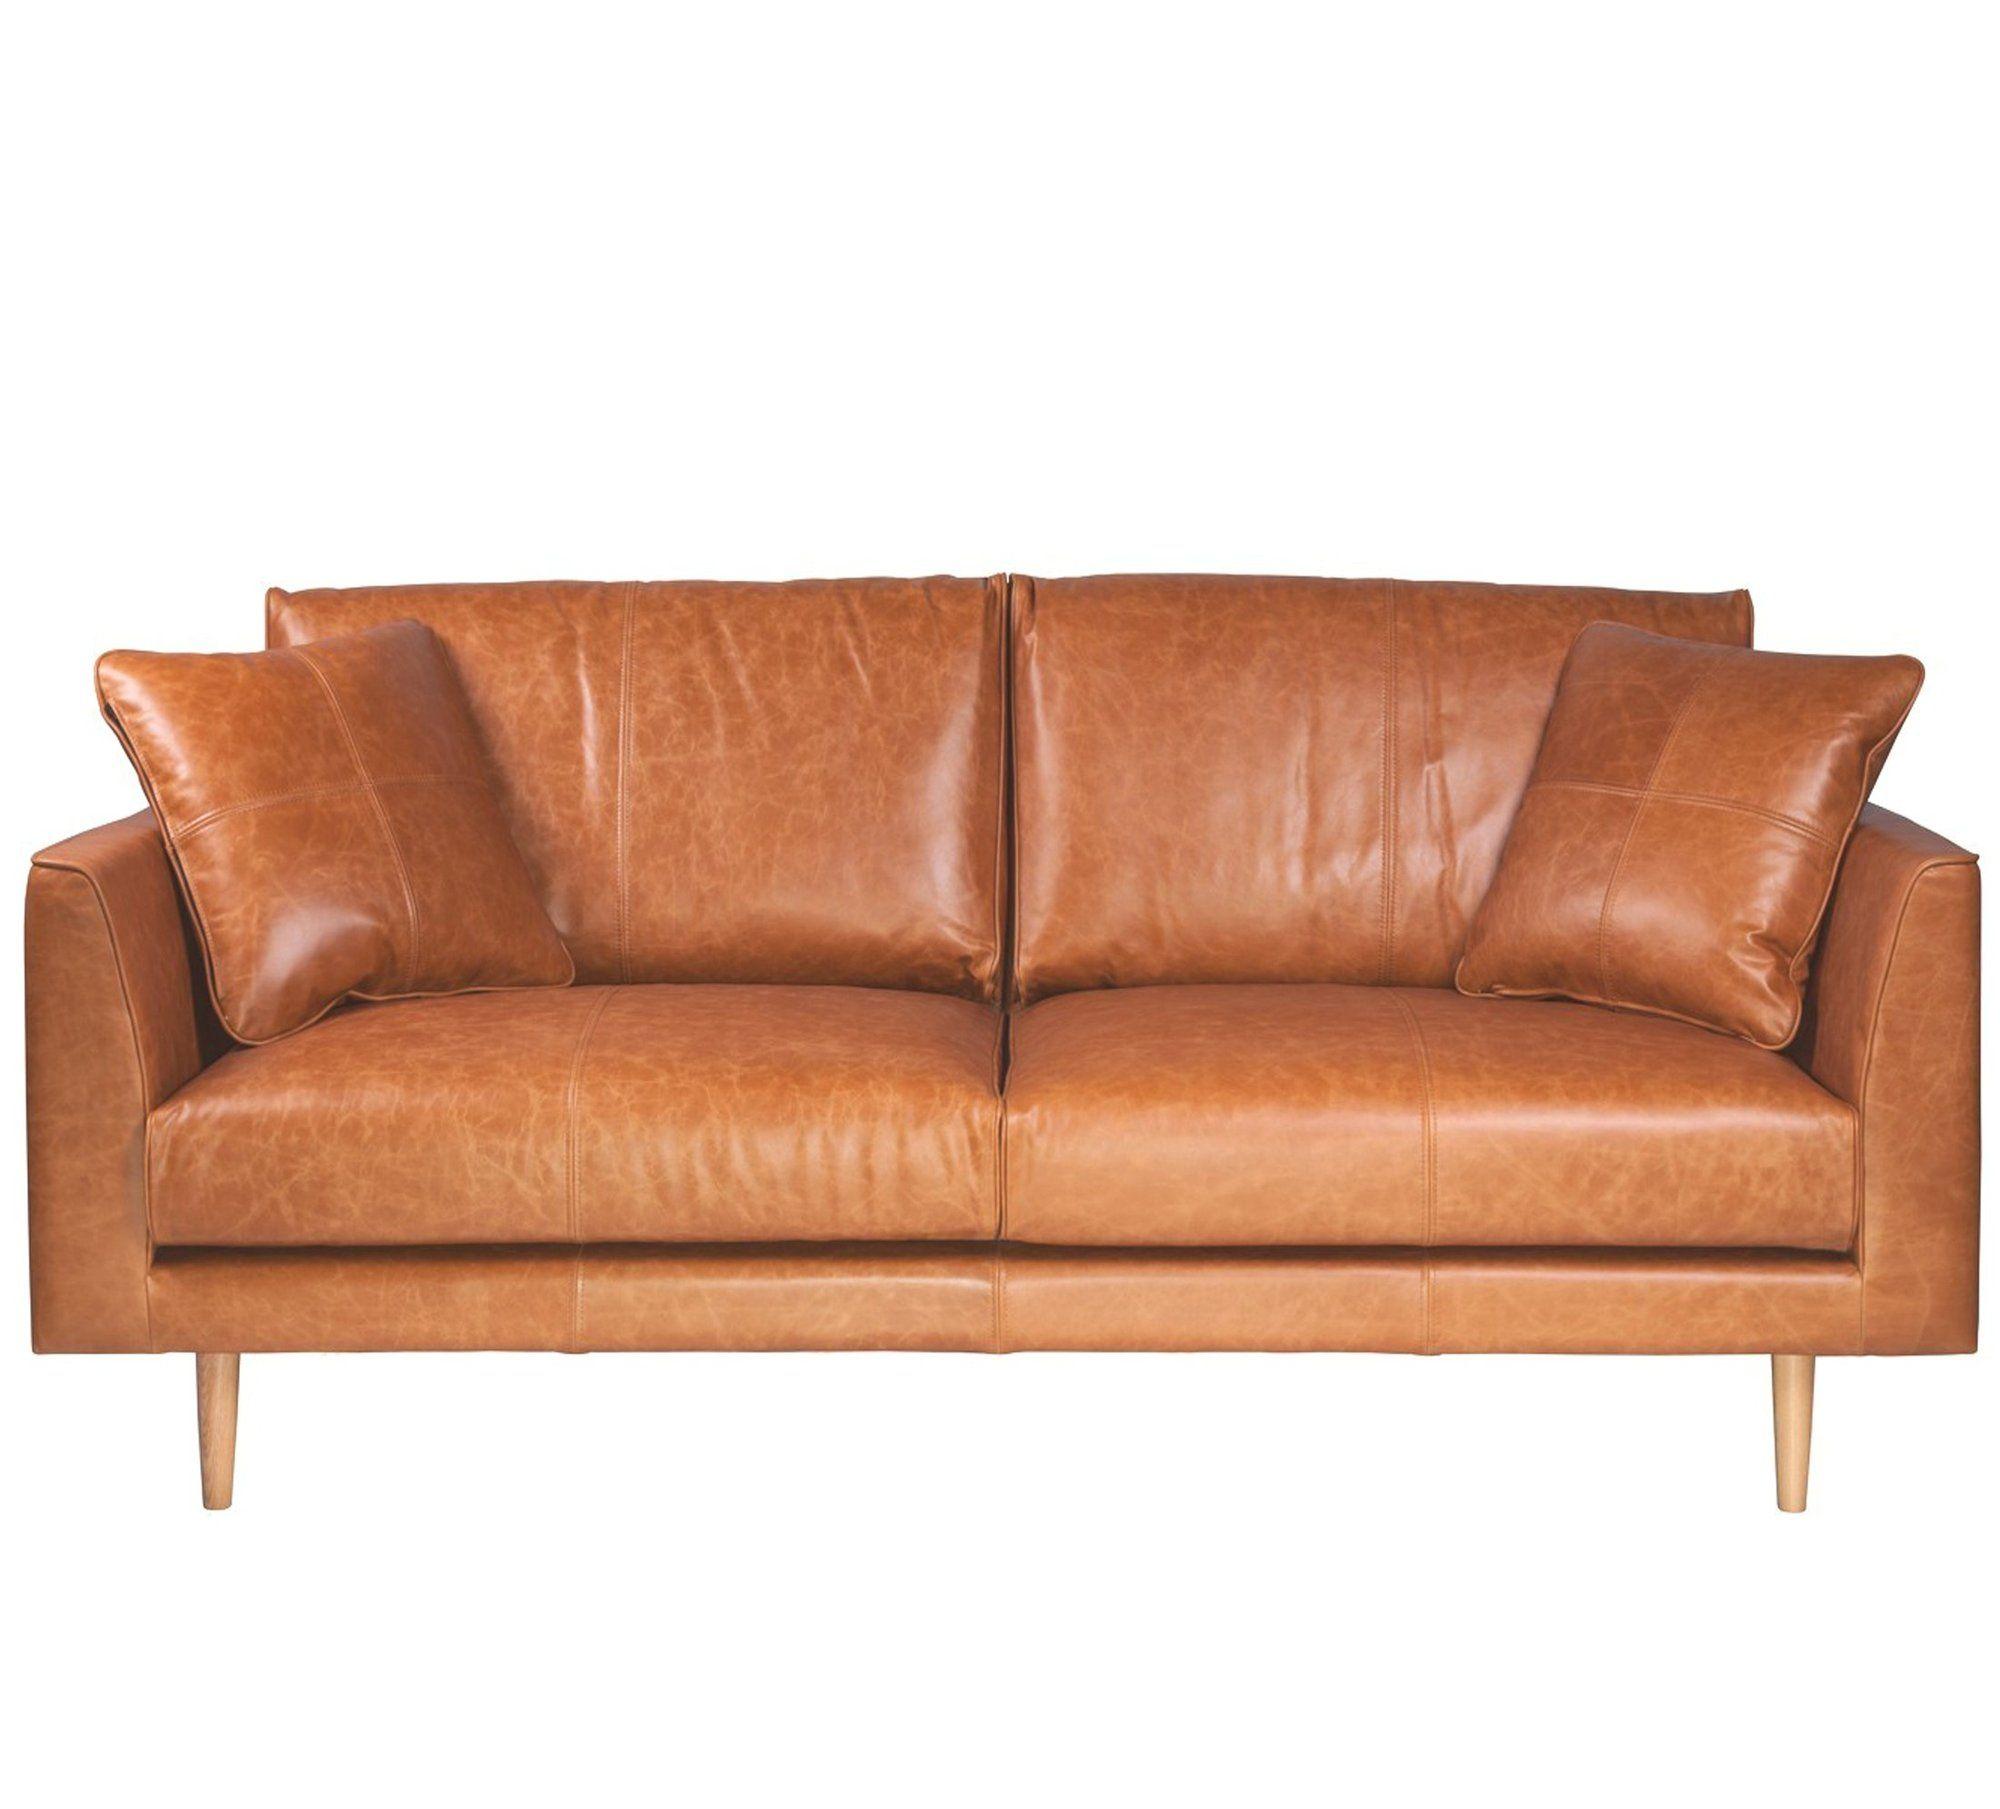 Narvik 3 seat sofa tan leather the modern furniture store